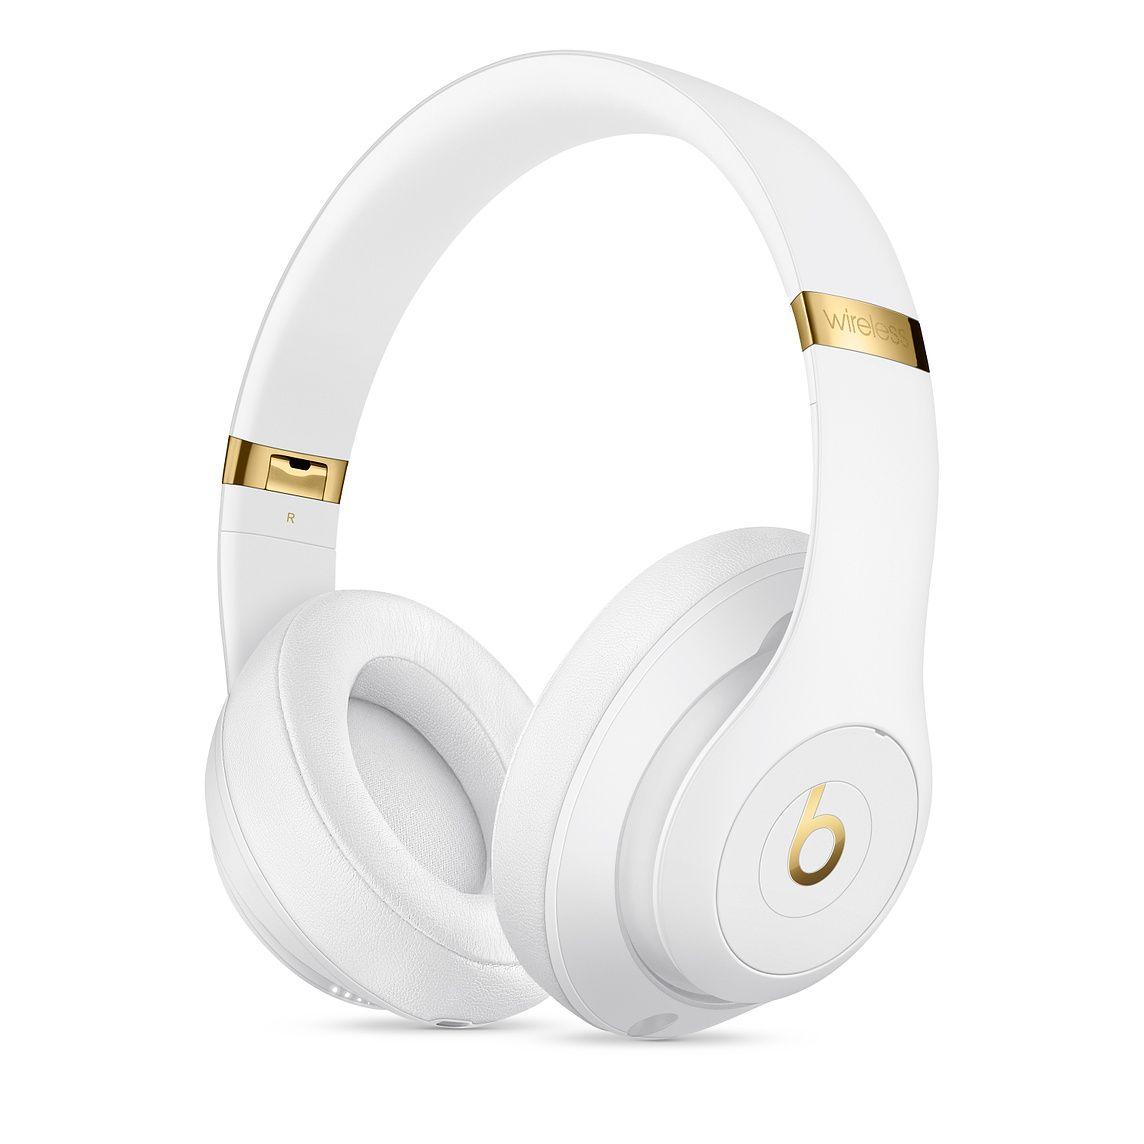 10efaa10db9 Beats Studio3 Wireless Over-Ear Headphones - Shadow Gray - Apple Auriculares  De Cancelación De